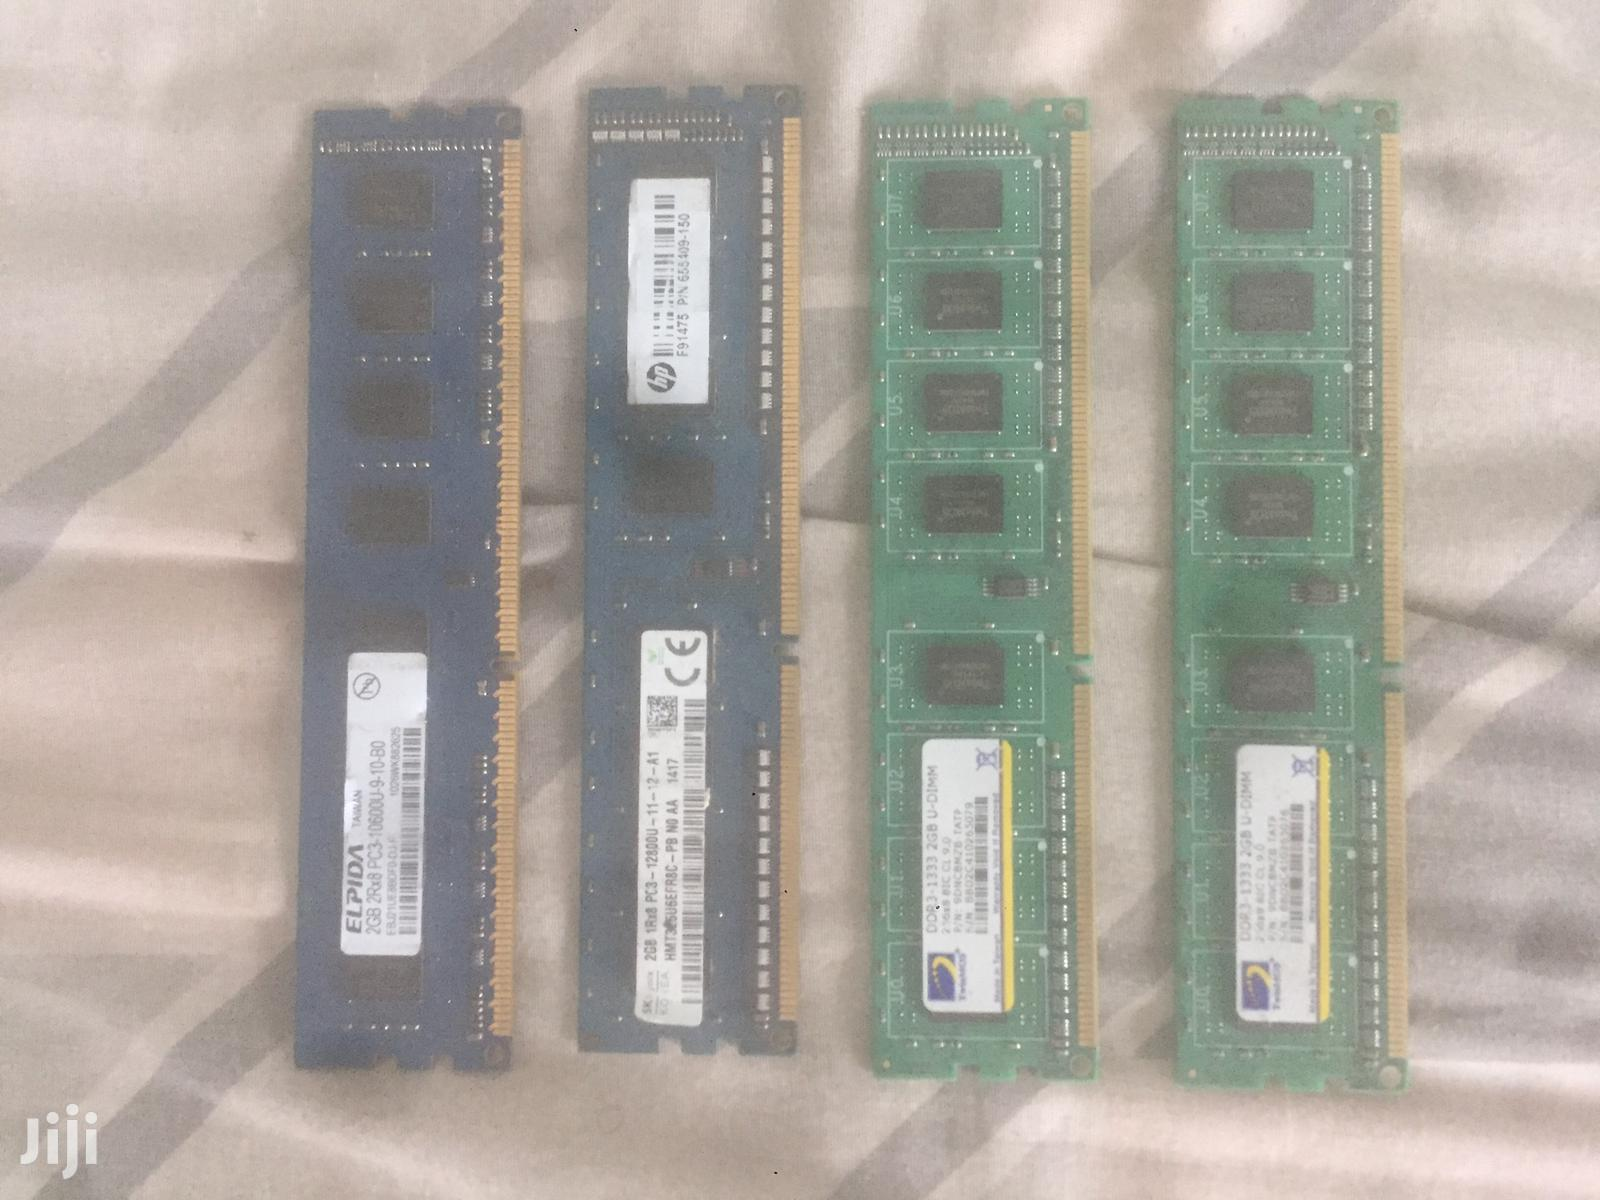 2GB DDR3 Desktop RAM Sticks For Sale | Computer Hardware for sale in Adenta Municipal, Greater Accra, Ghana